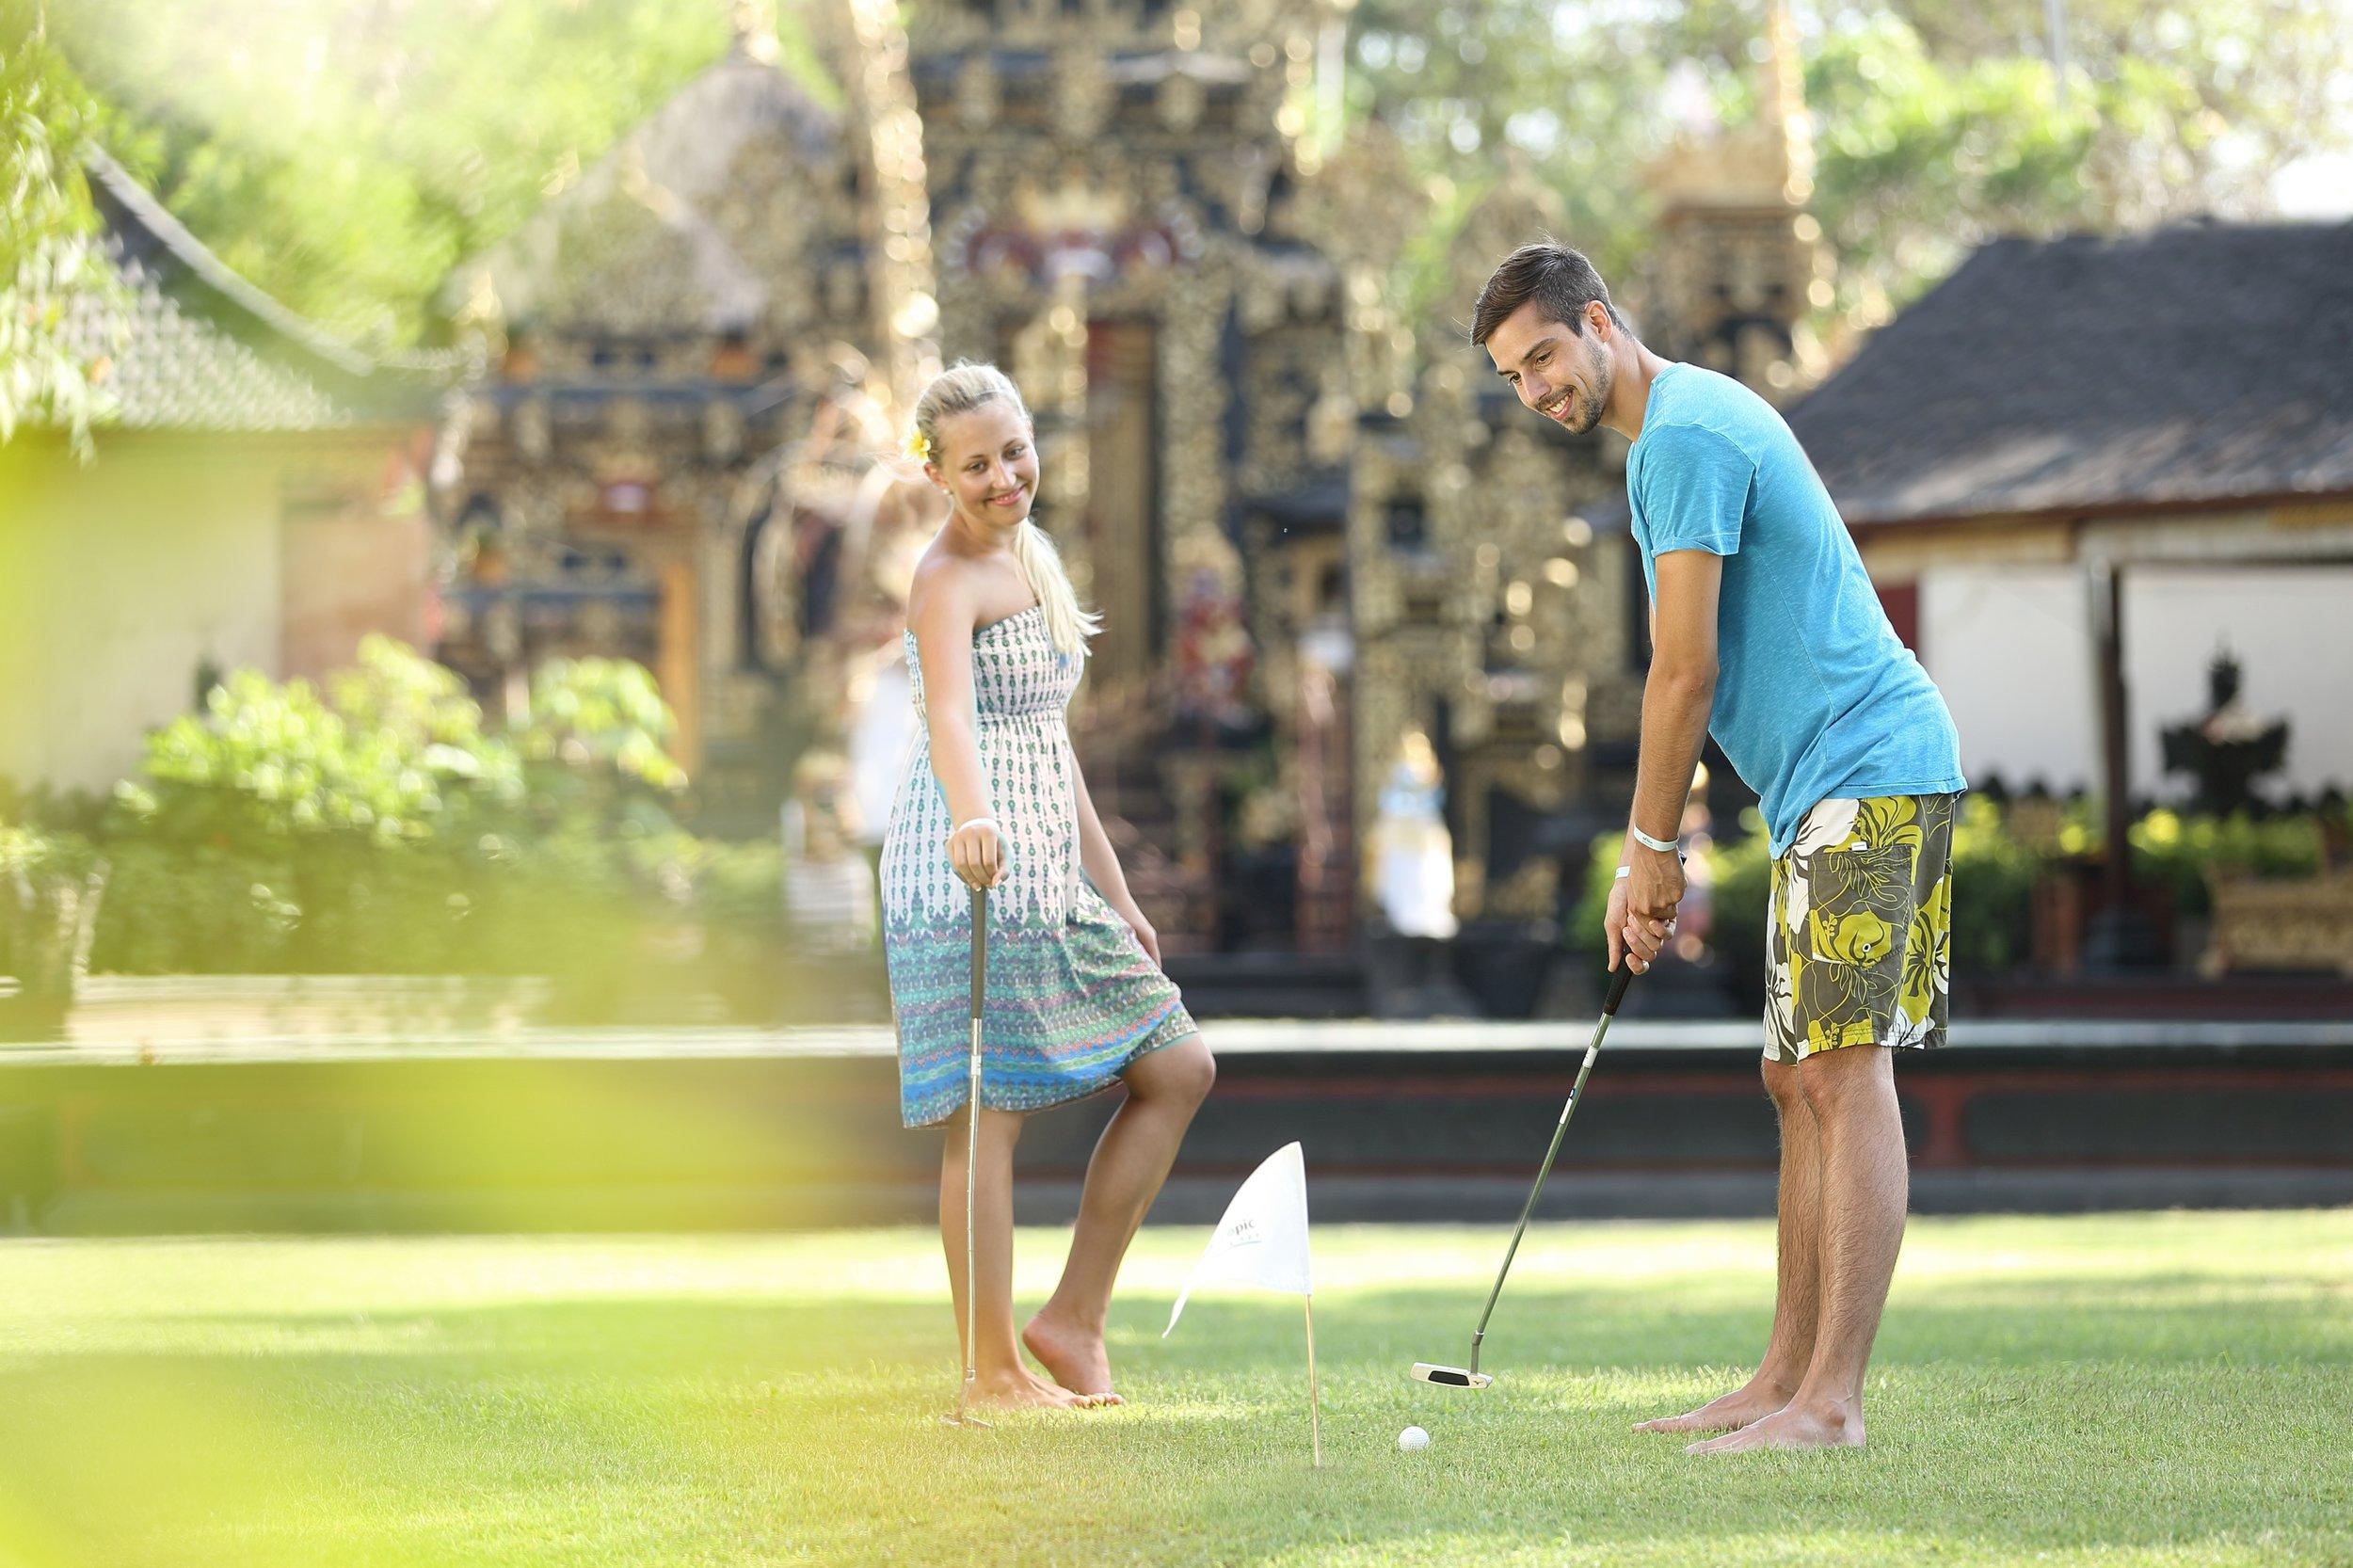 20-Mini Golf-2.jpg